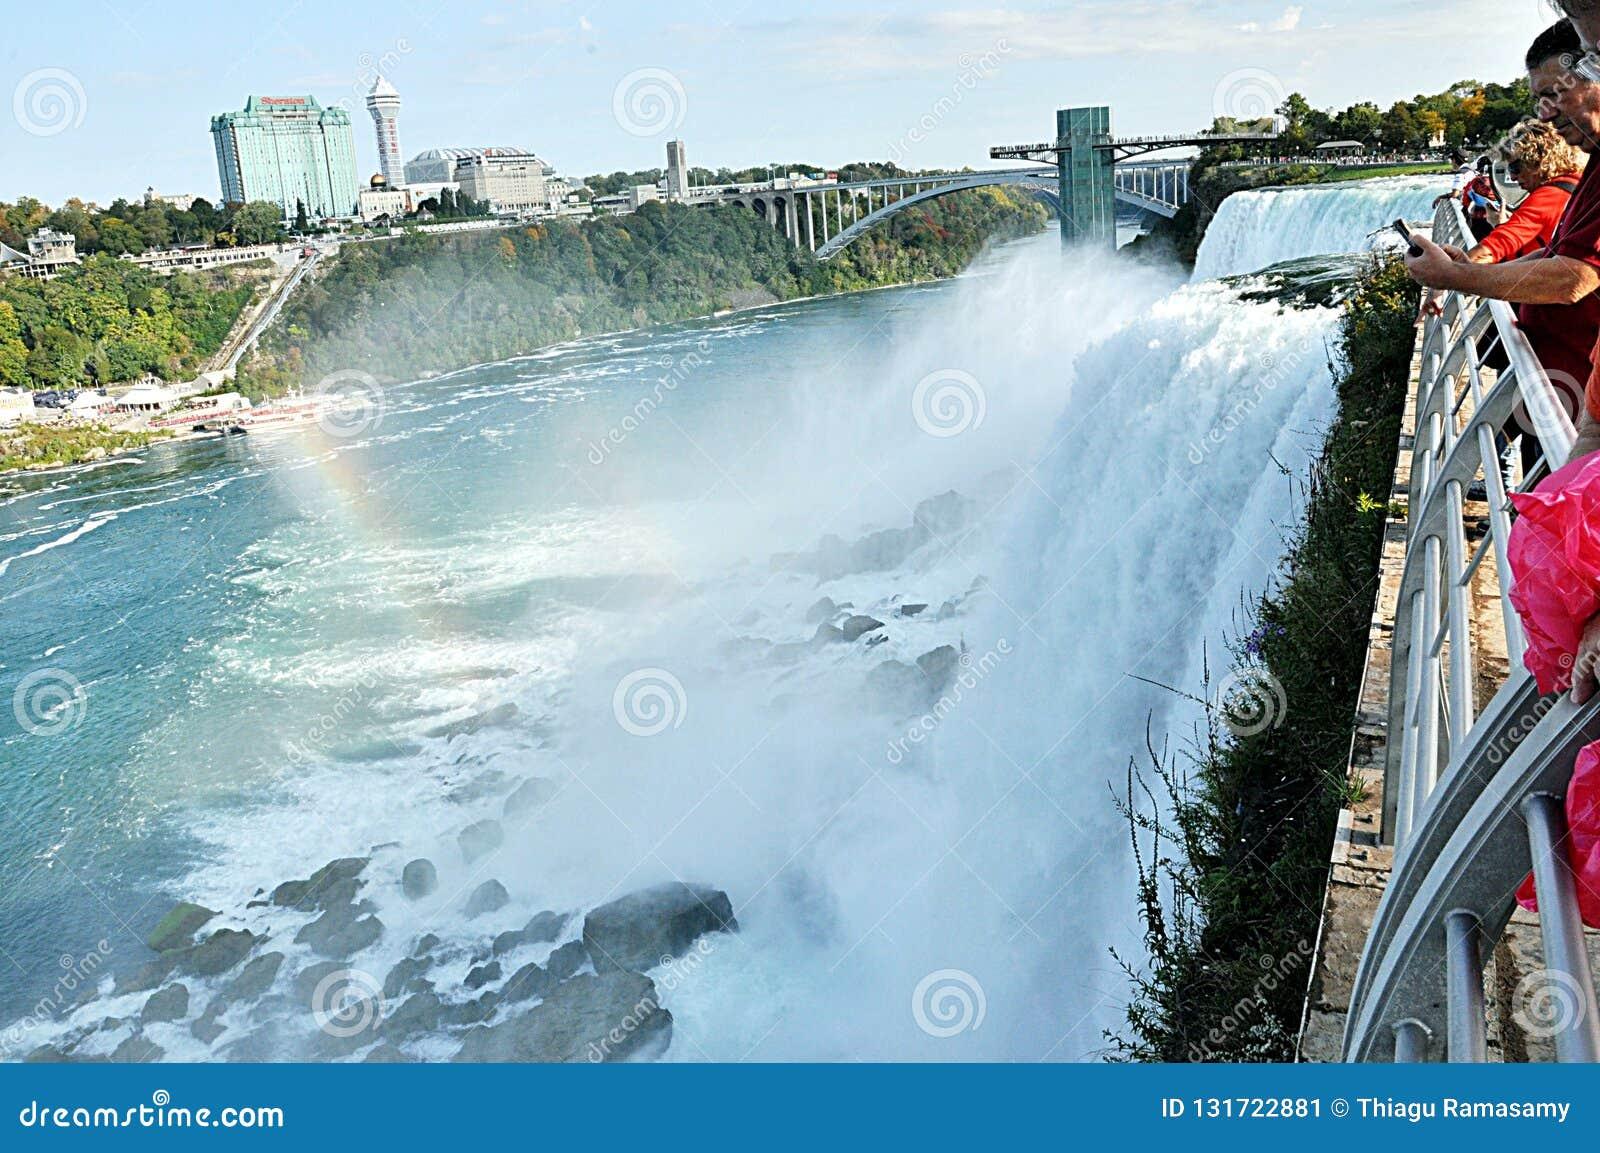 Niagara Falls With View Of Canada Side Editorial Photo Image Of Niagara Scenic 131722881